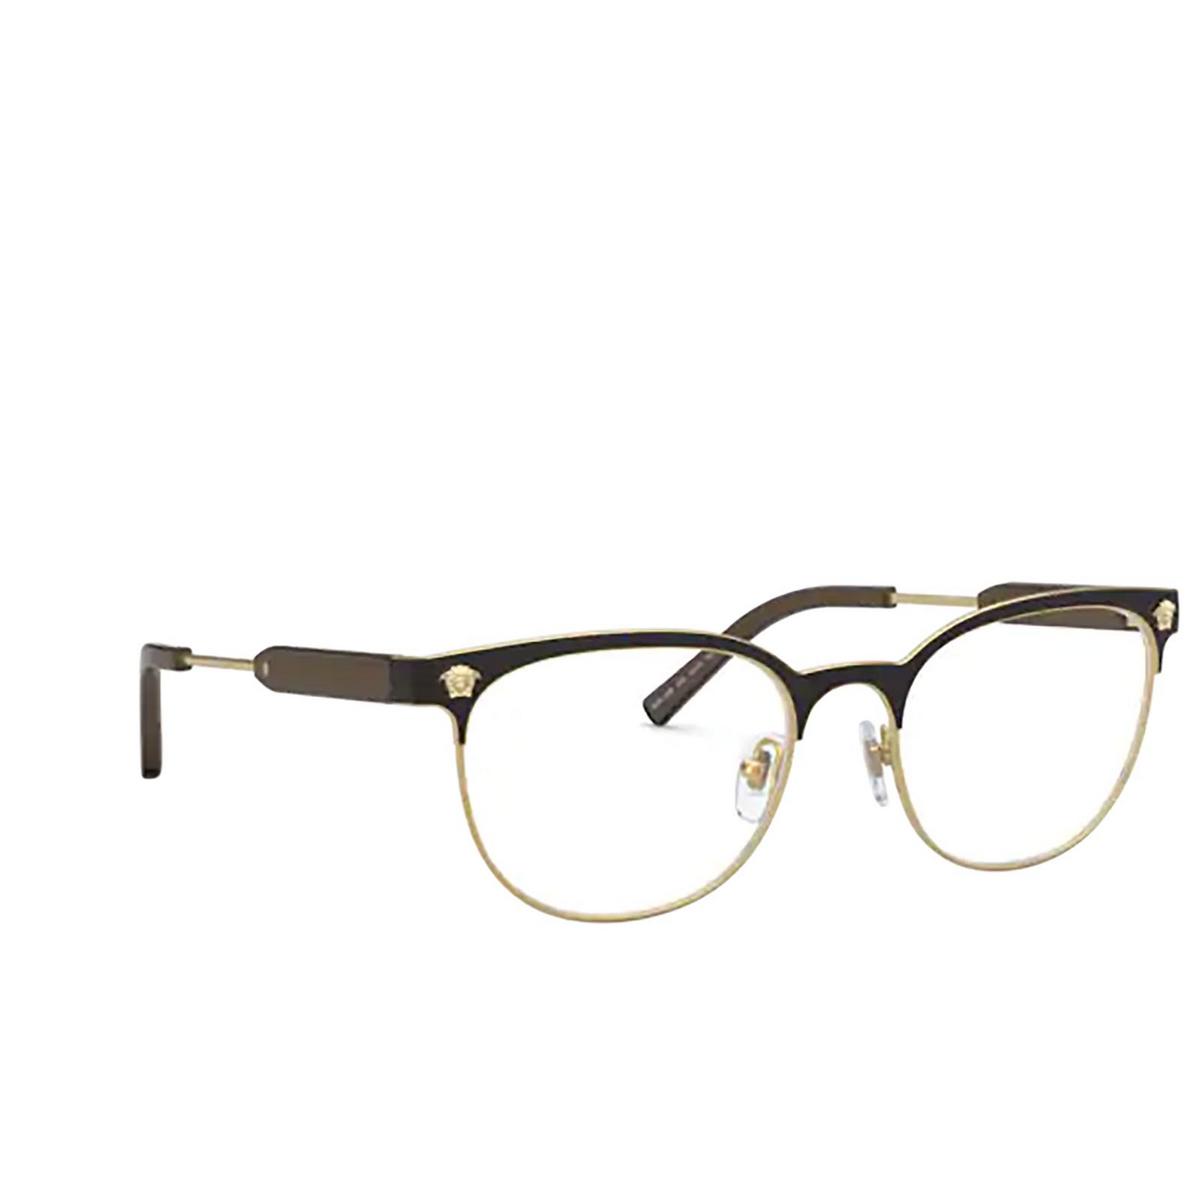 Versace® Oval Eyeglasses: VE1268 color Matte Black / Gold 1261 - three-quarters view.